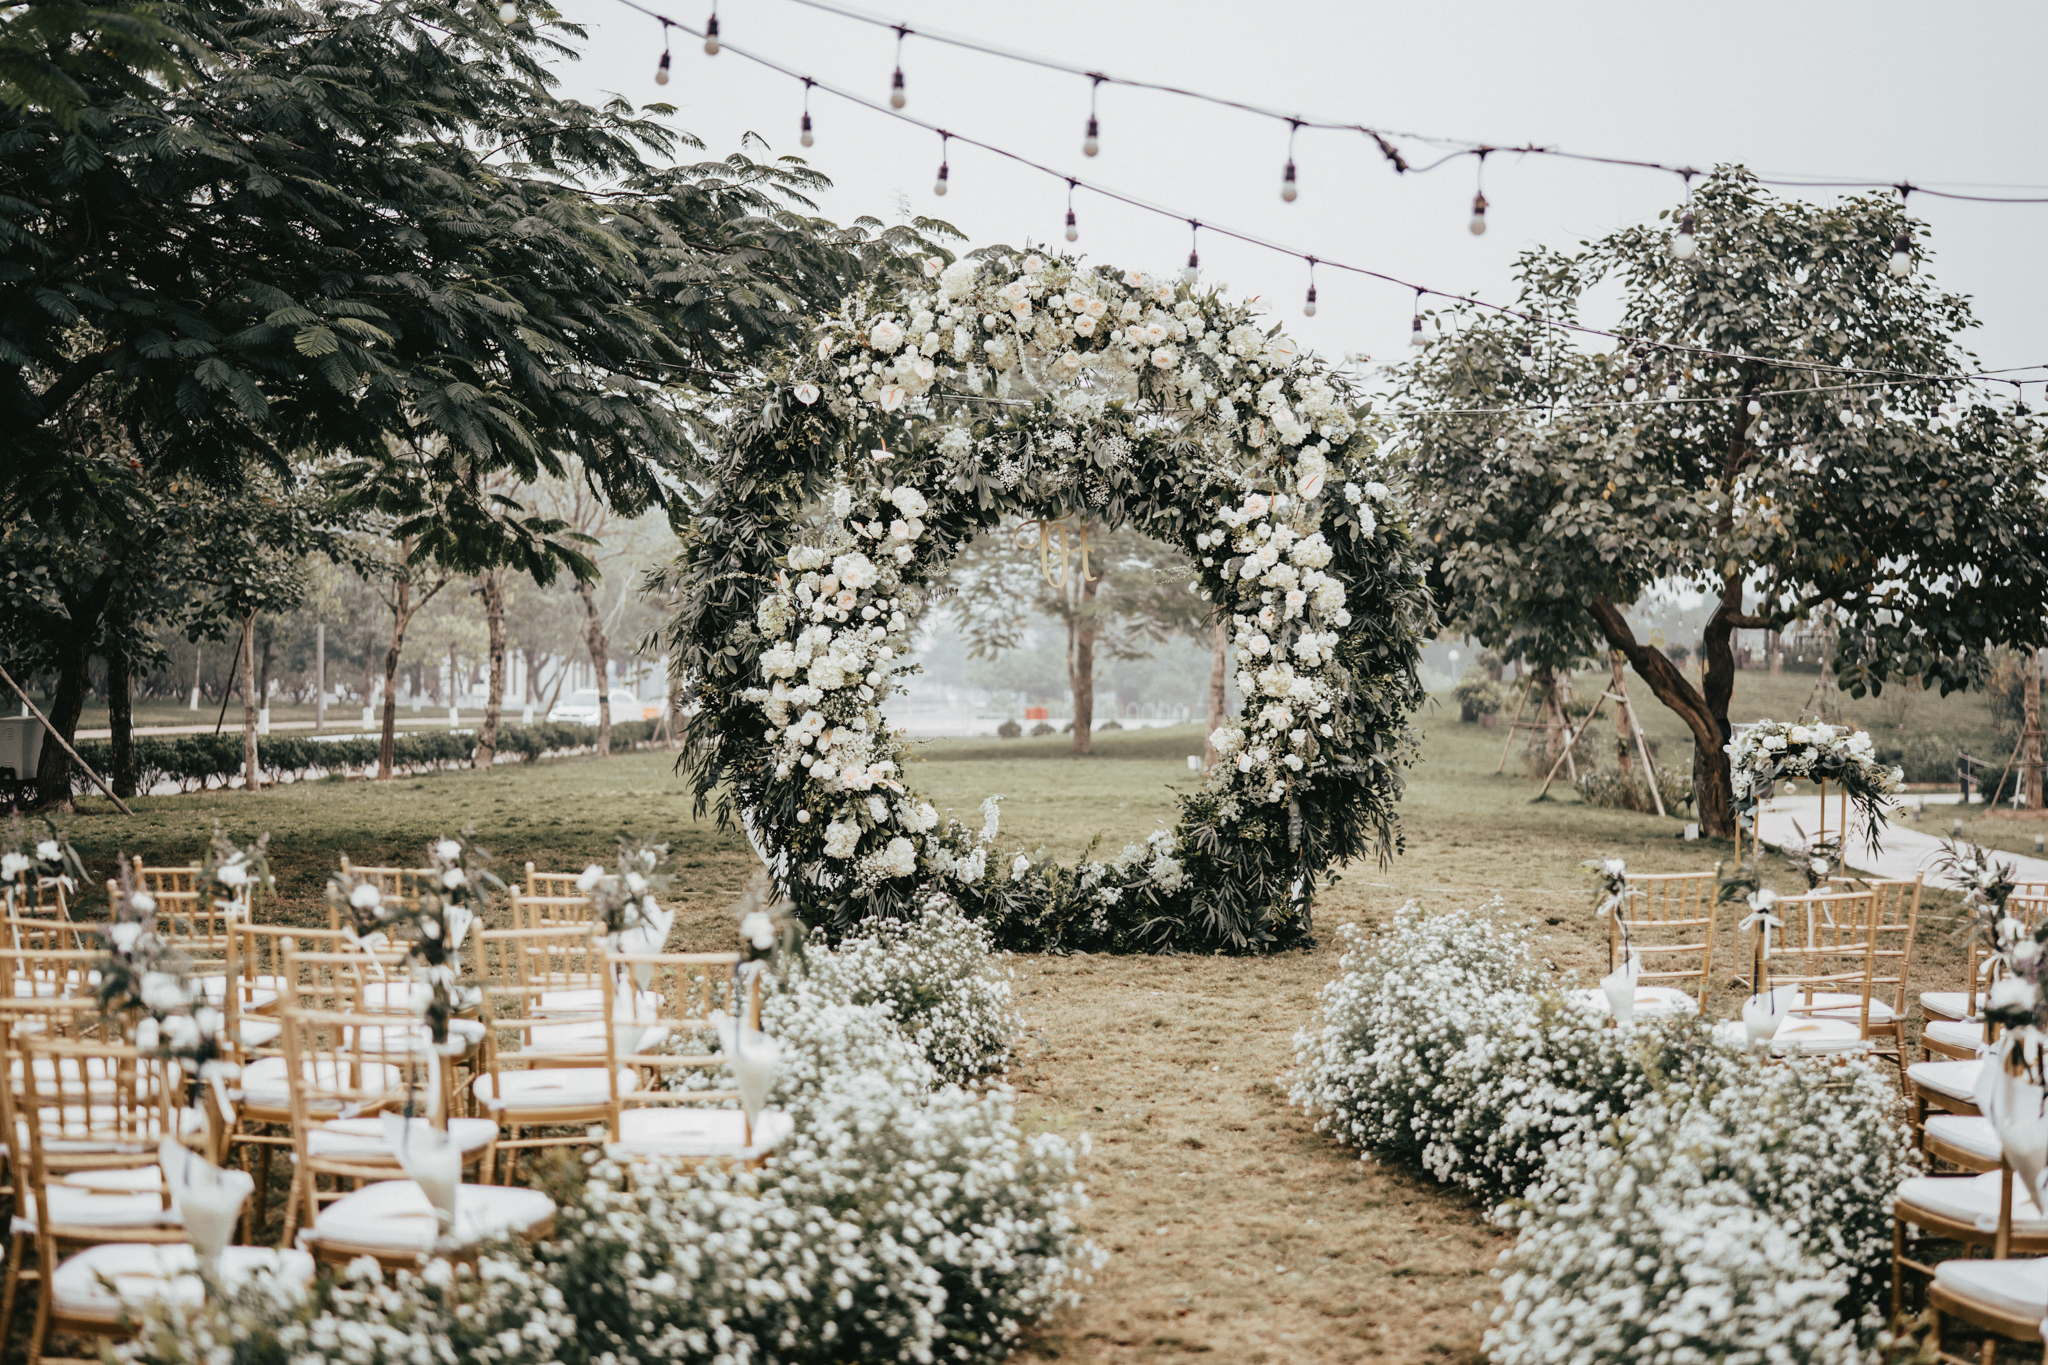 JWMarriott Ha Noi Intimate Wedding of Trang Hi well captured by Hipster Wedding Vietnam Wedding Photographer-97191.jpg